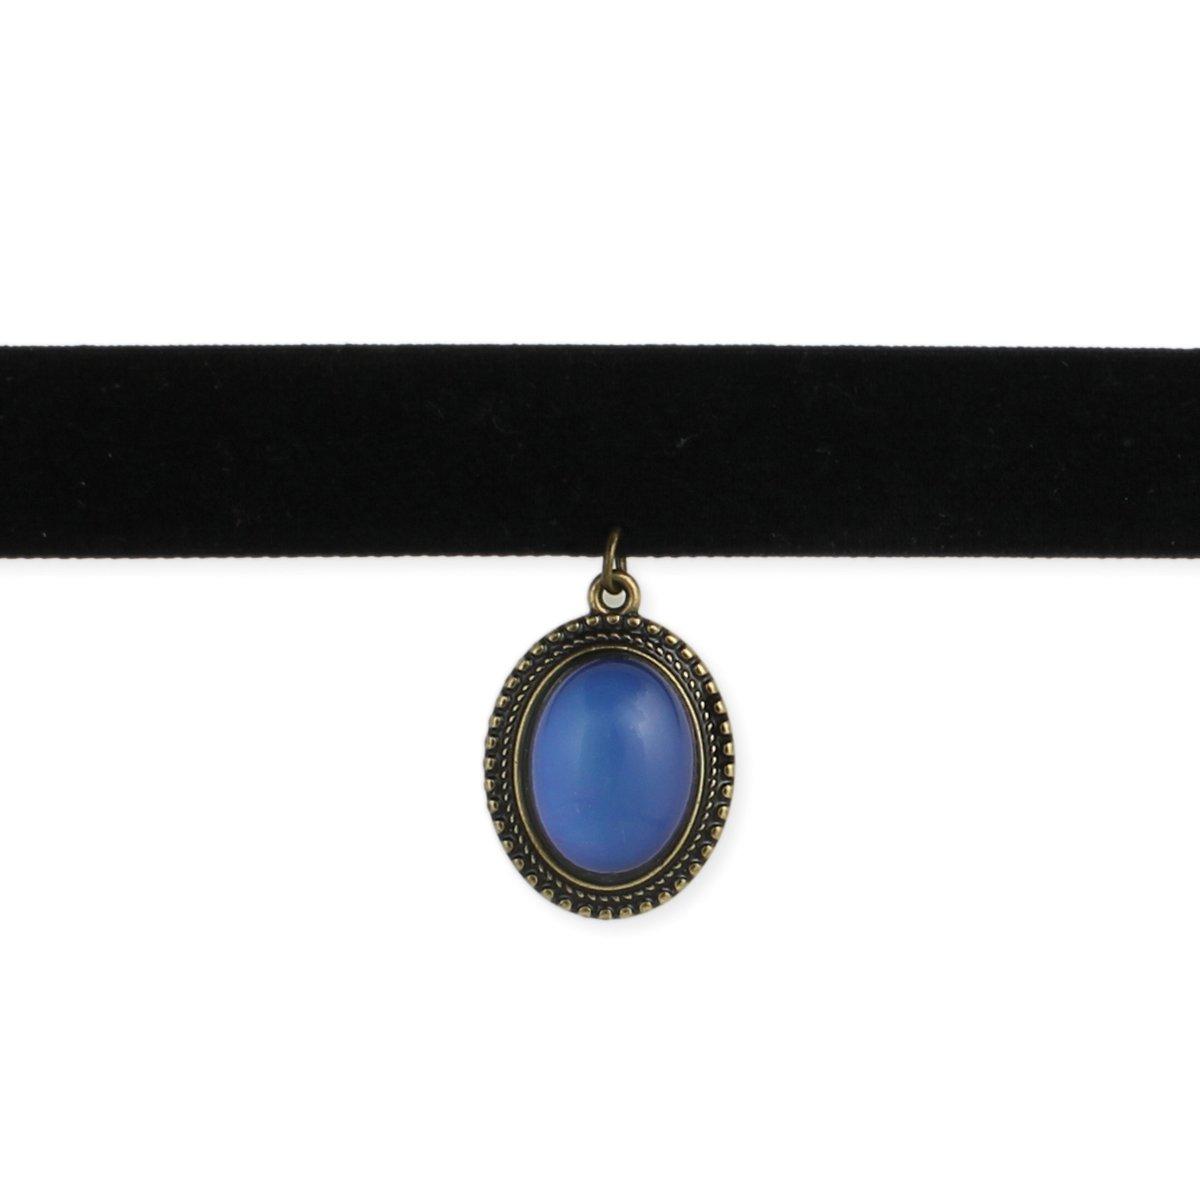 Classic Black Velvet Mood Choker Necklace - Retro 1990's Style